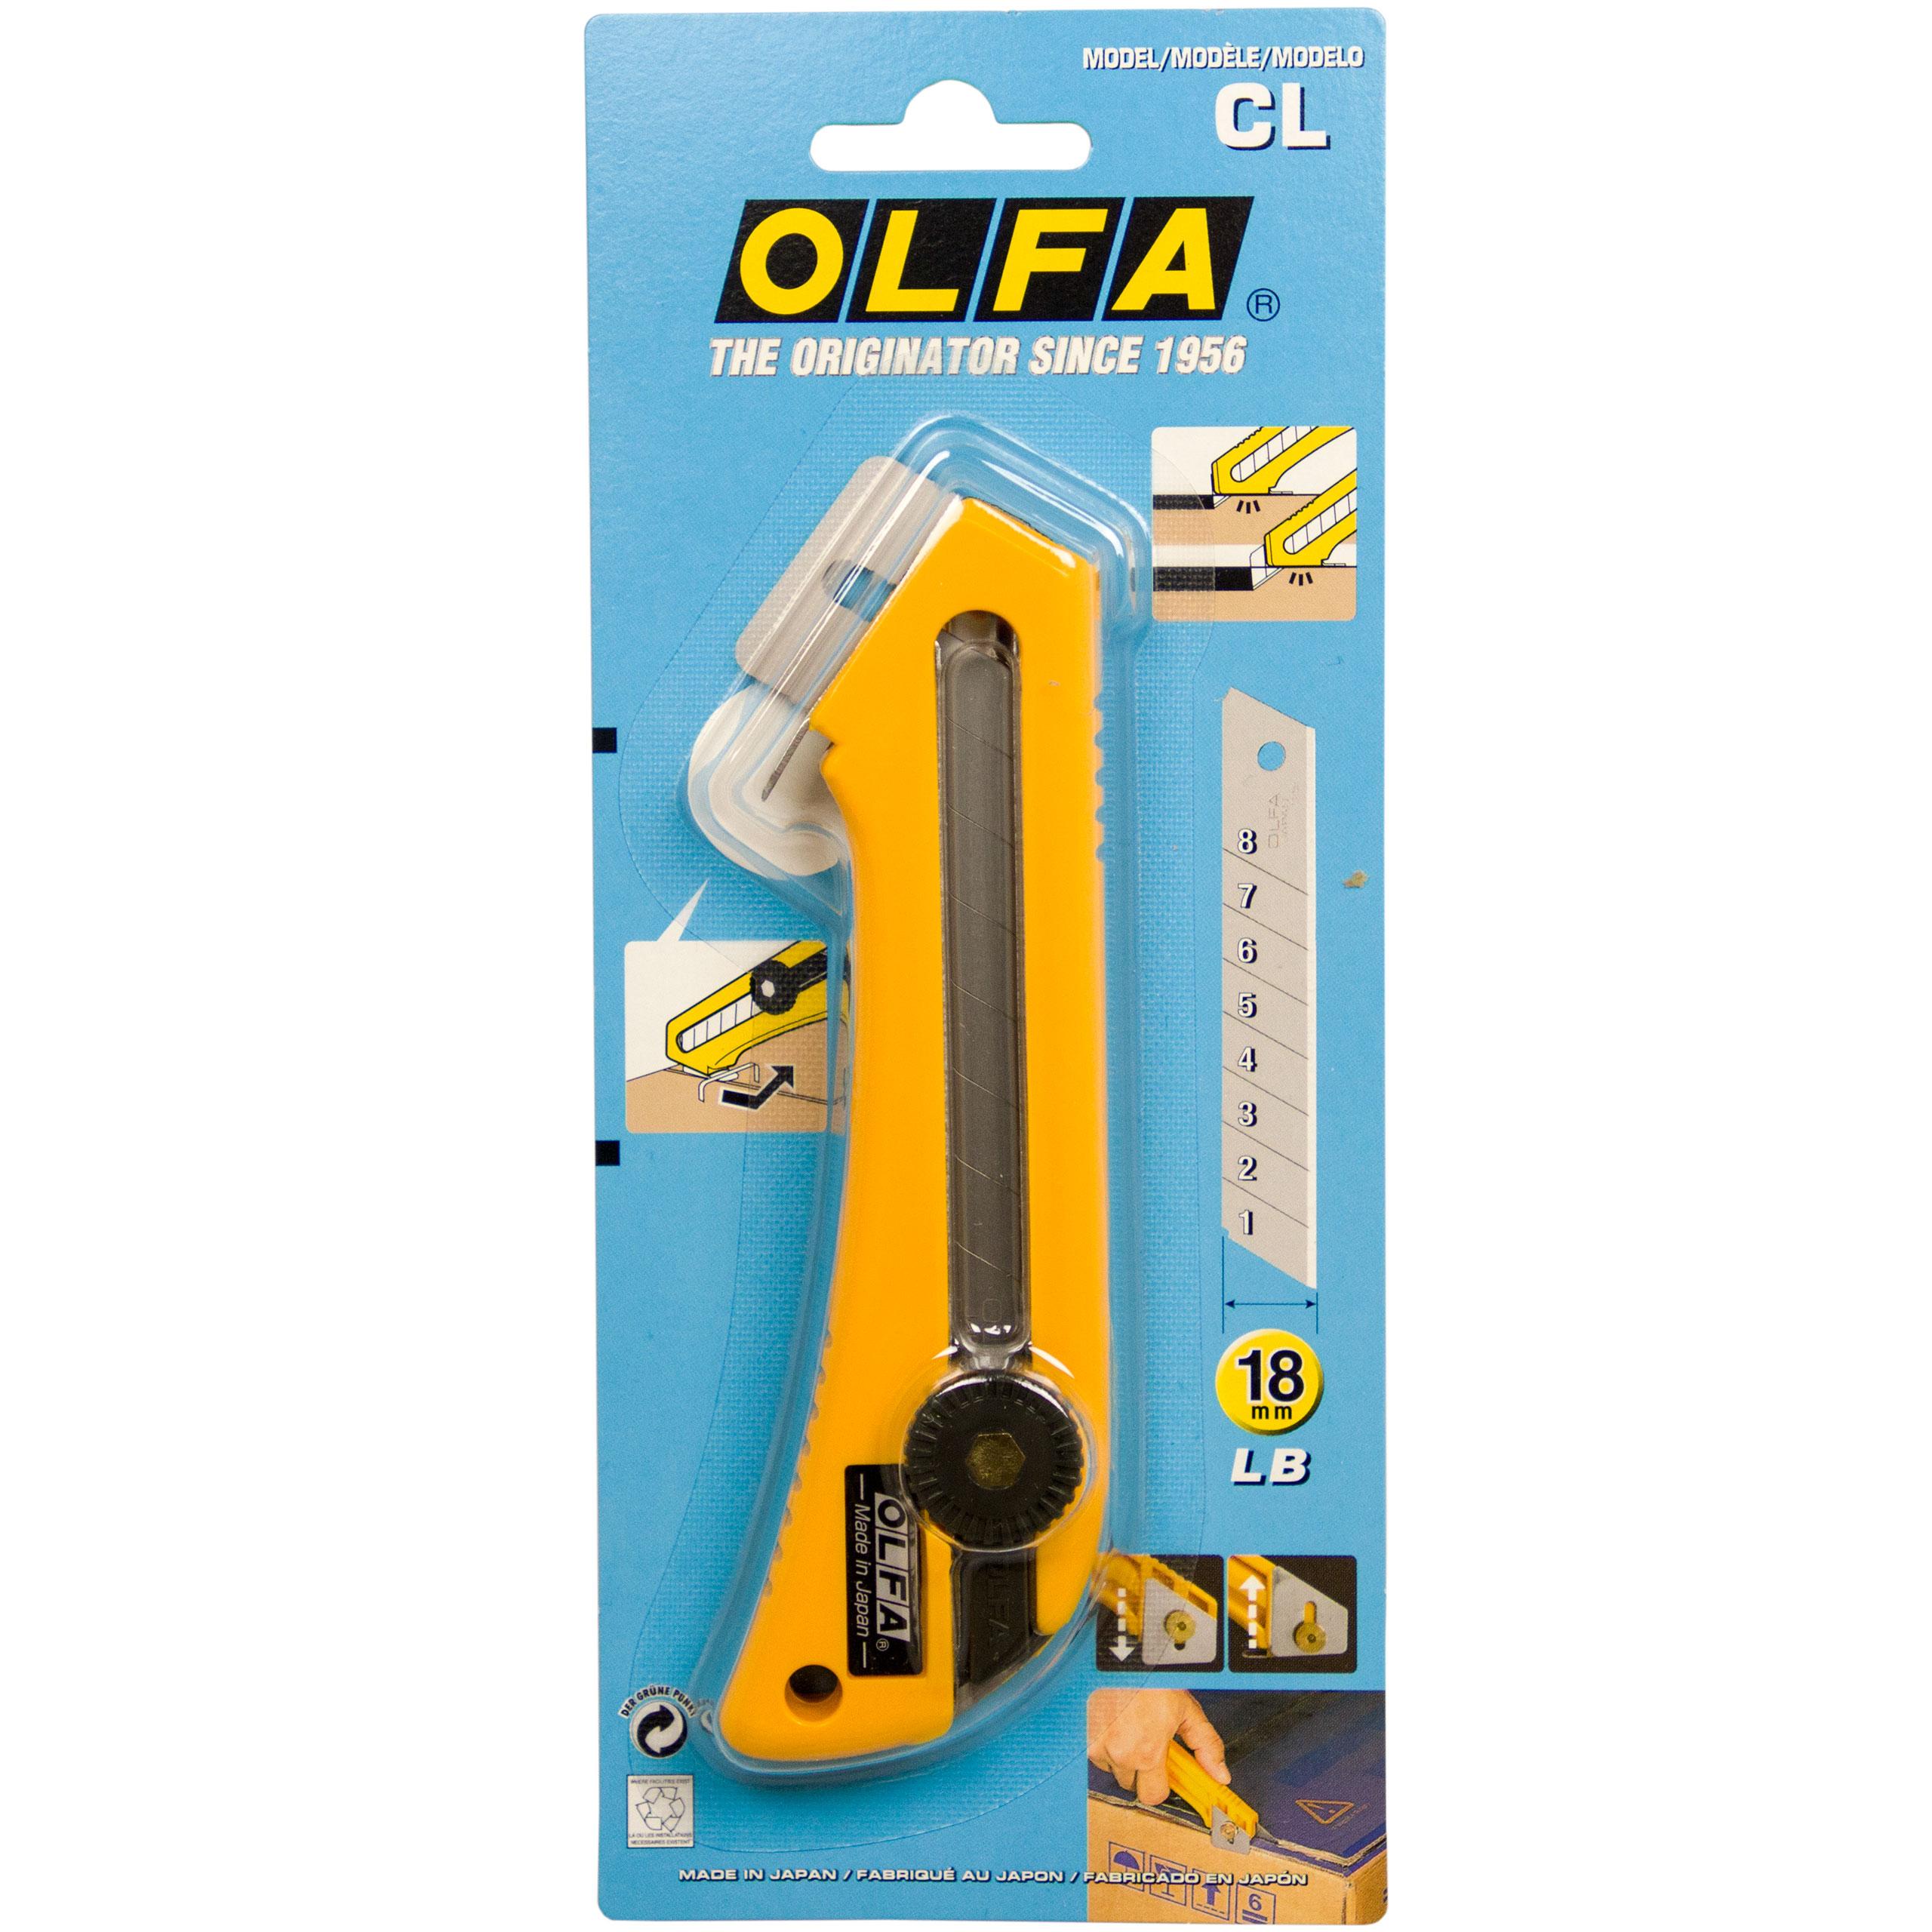 Olfa Cutter CL Schneidecutter mit integriertem